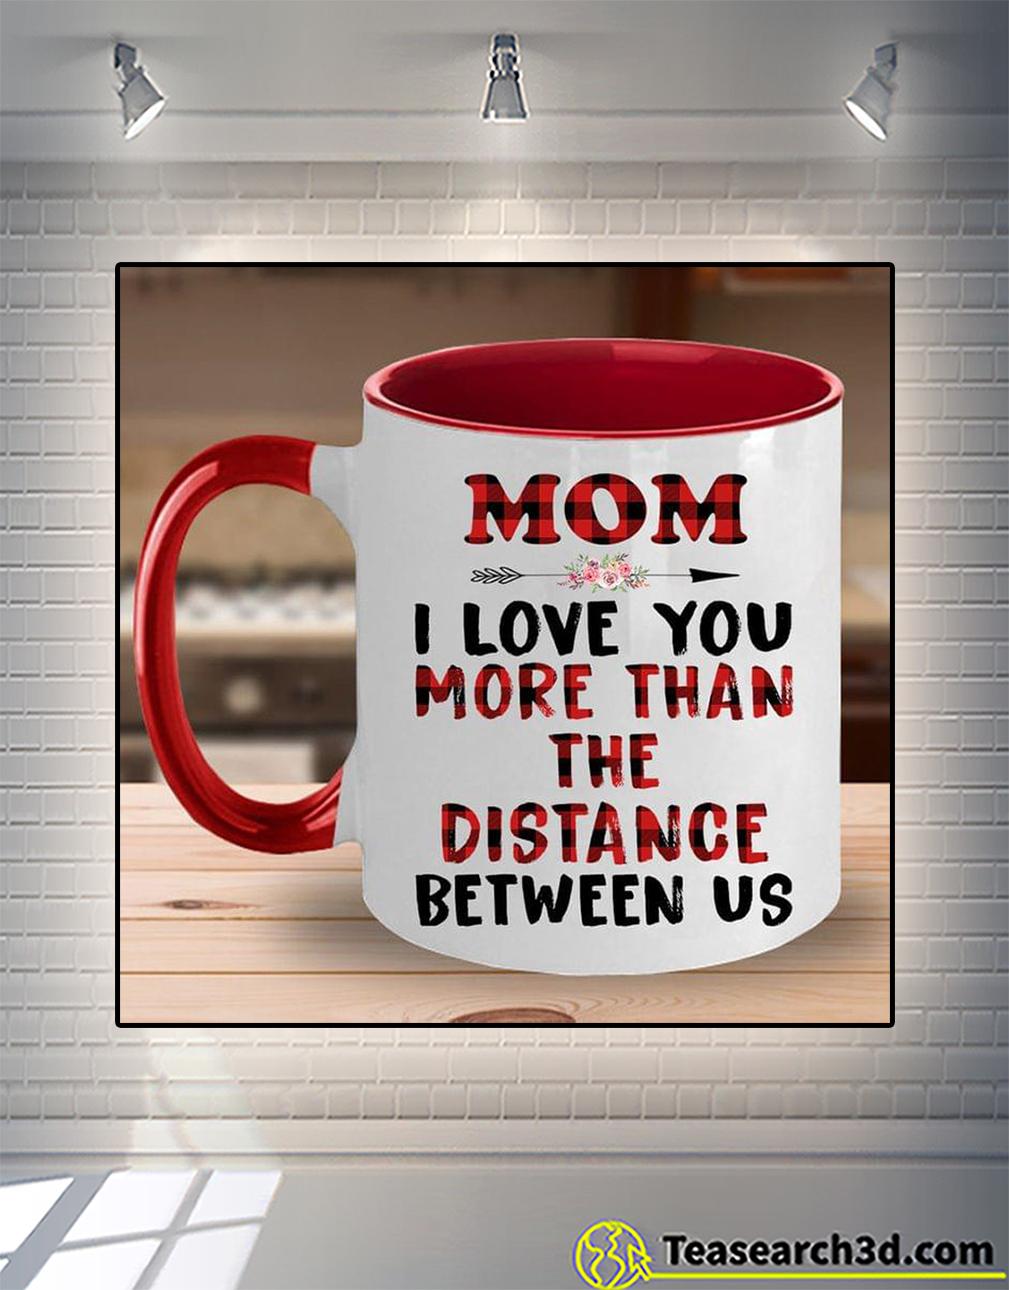 Mom I love you more than the distance between us mug